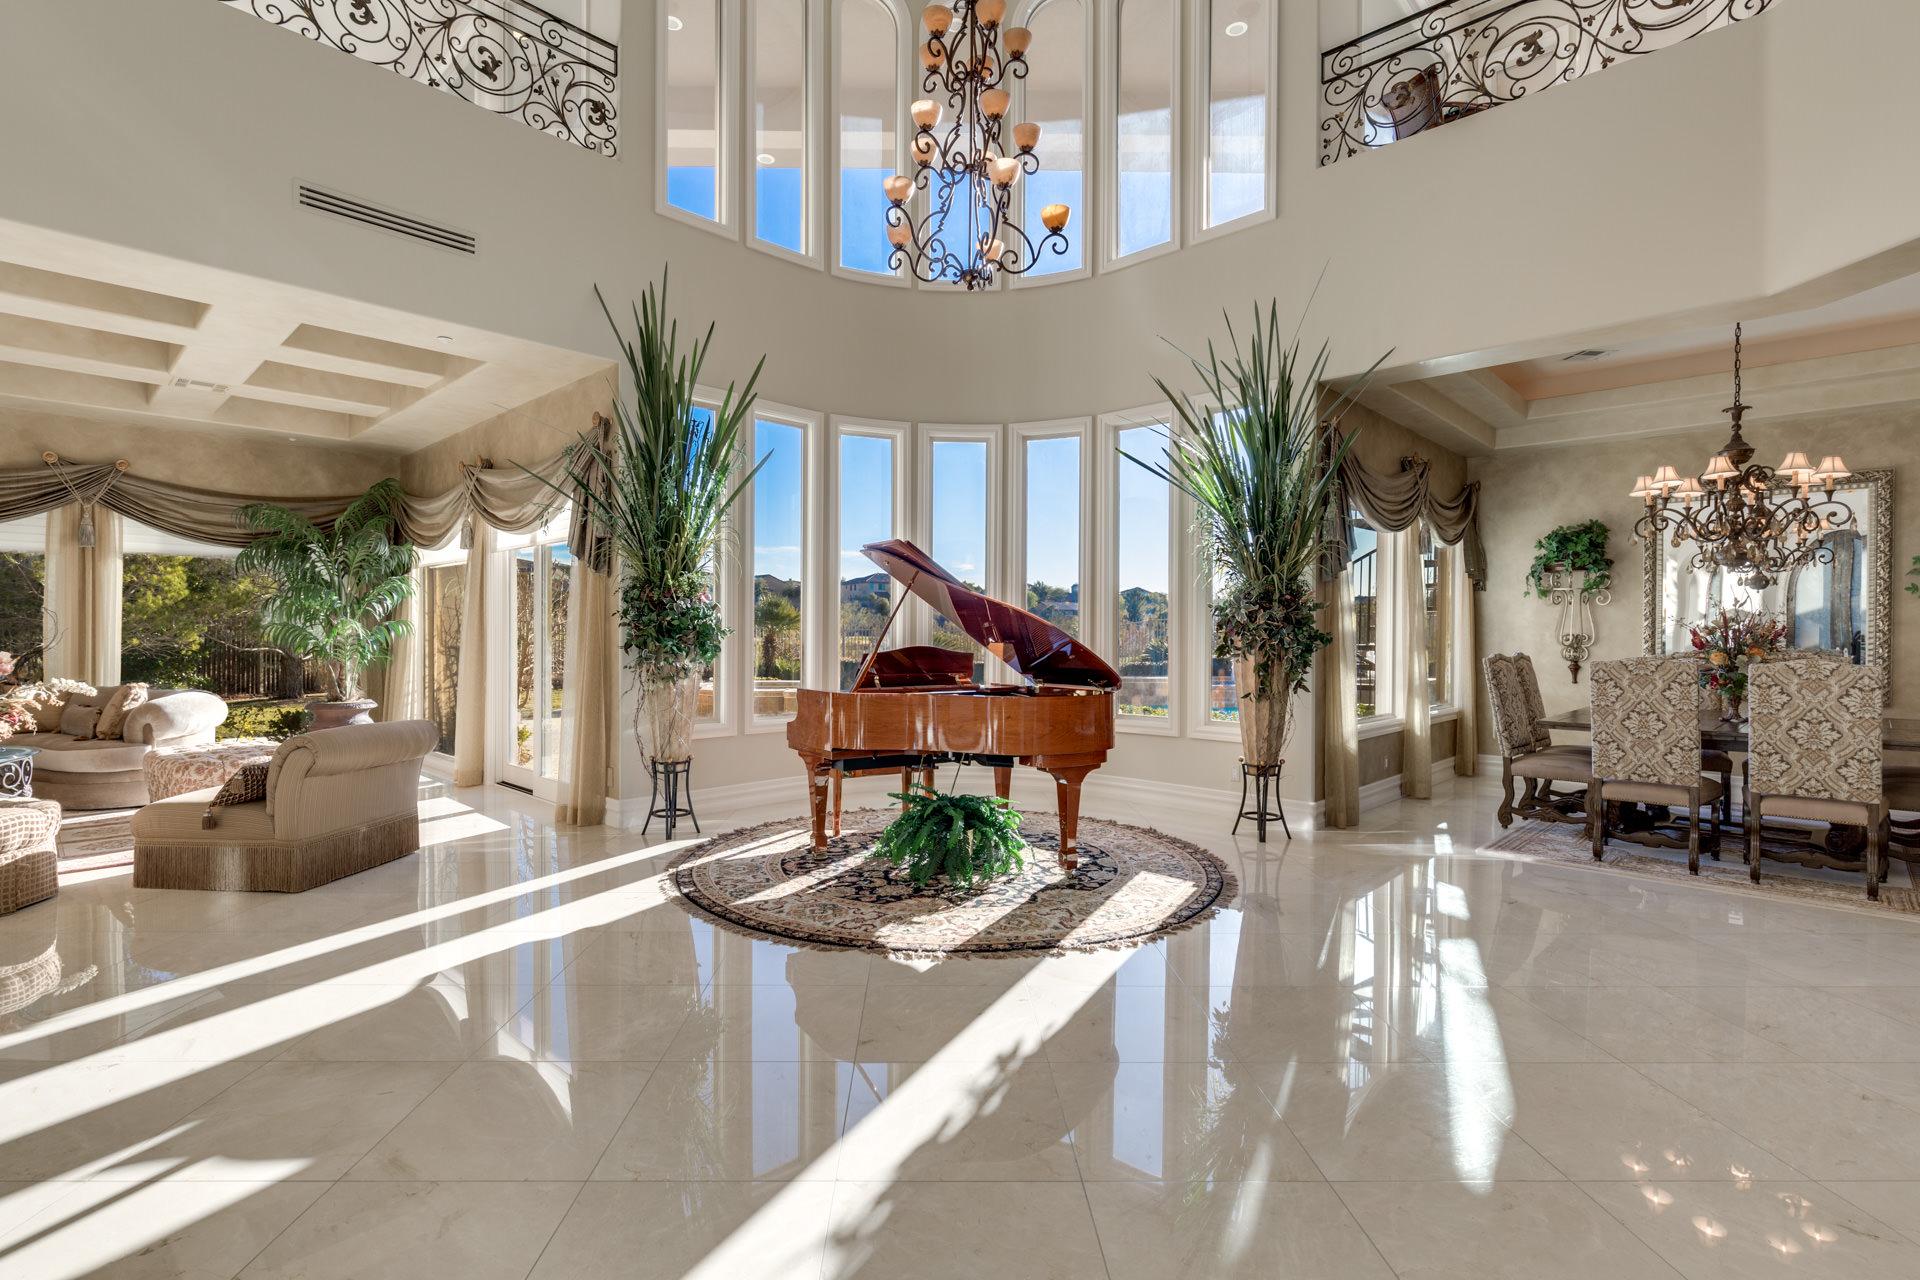 Million Dollar Homes in Las Vegas for Sale | $1M - $3M